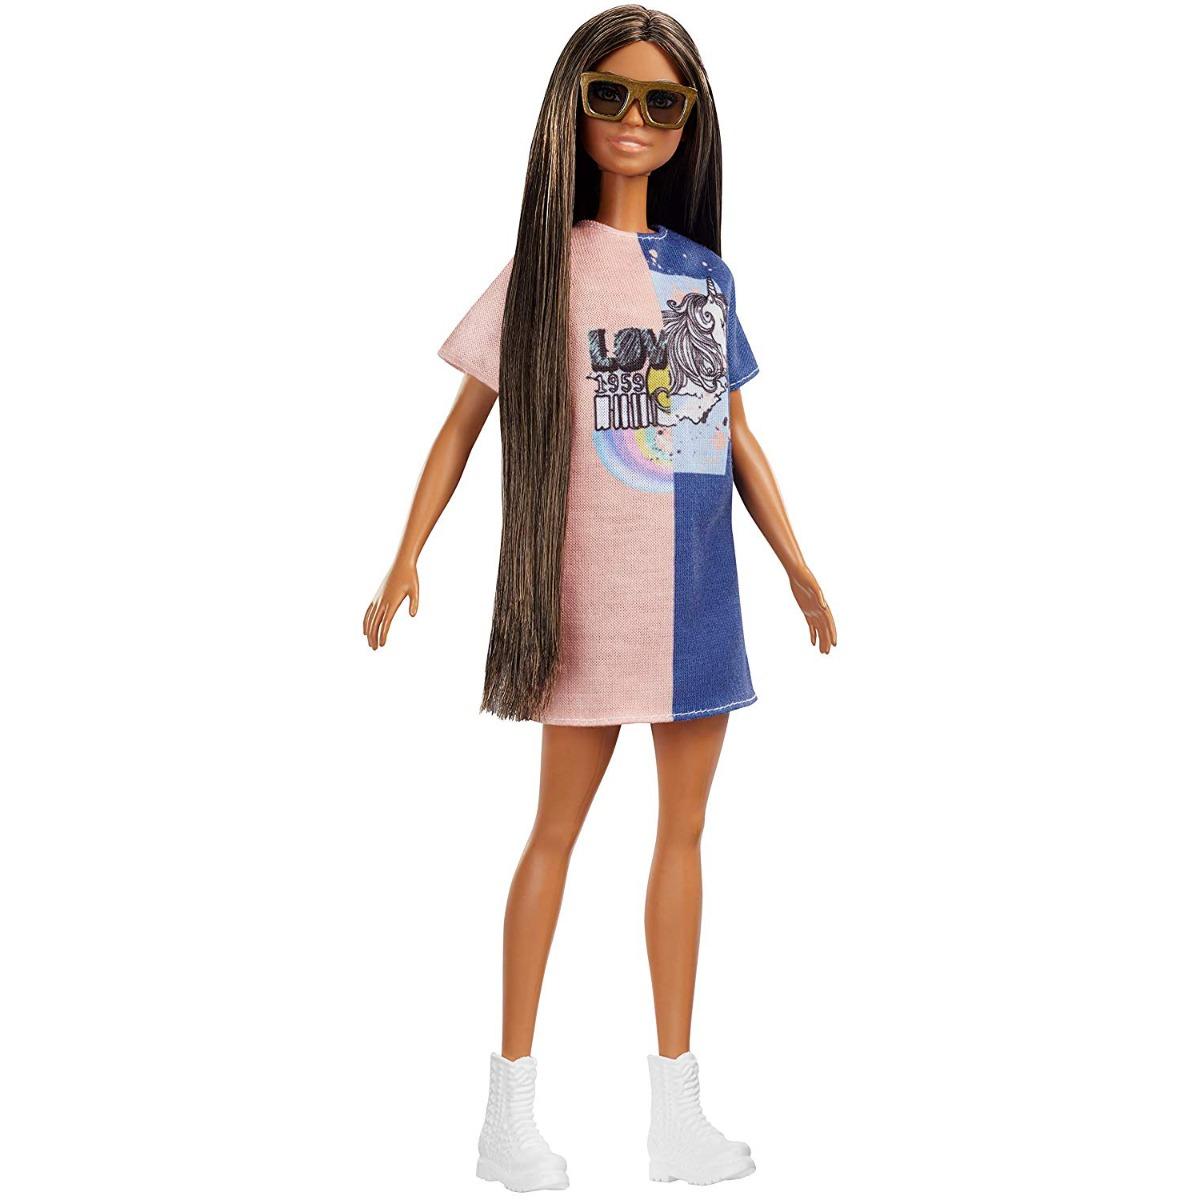 Papusa Barbie Fashionistas - Style, FXL43